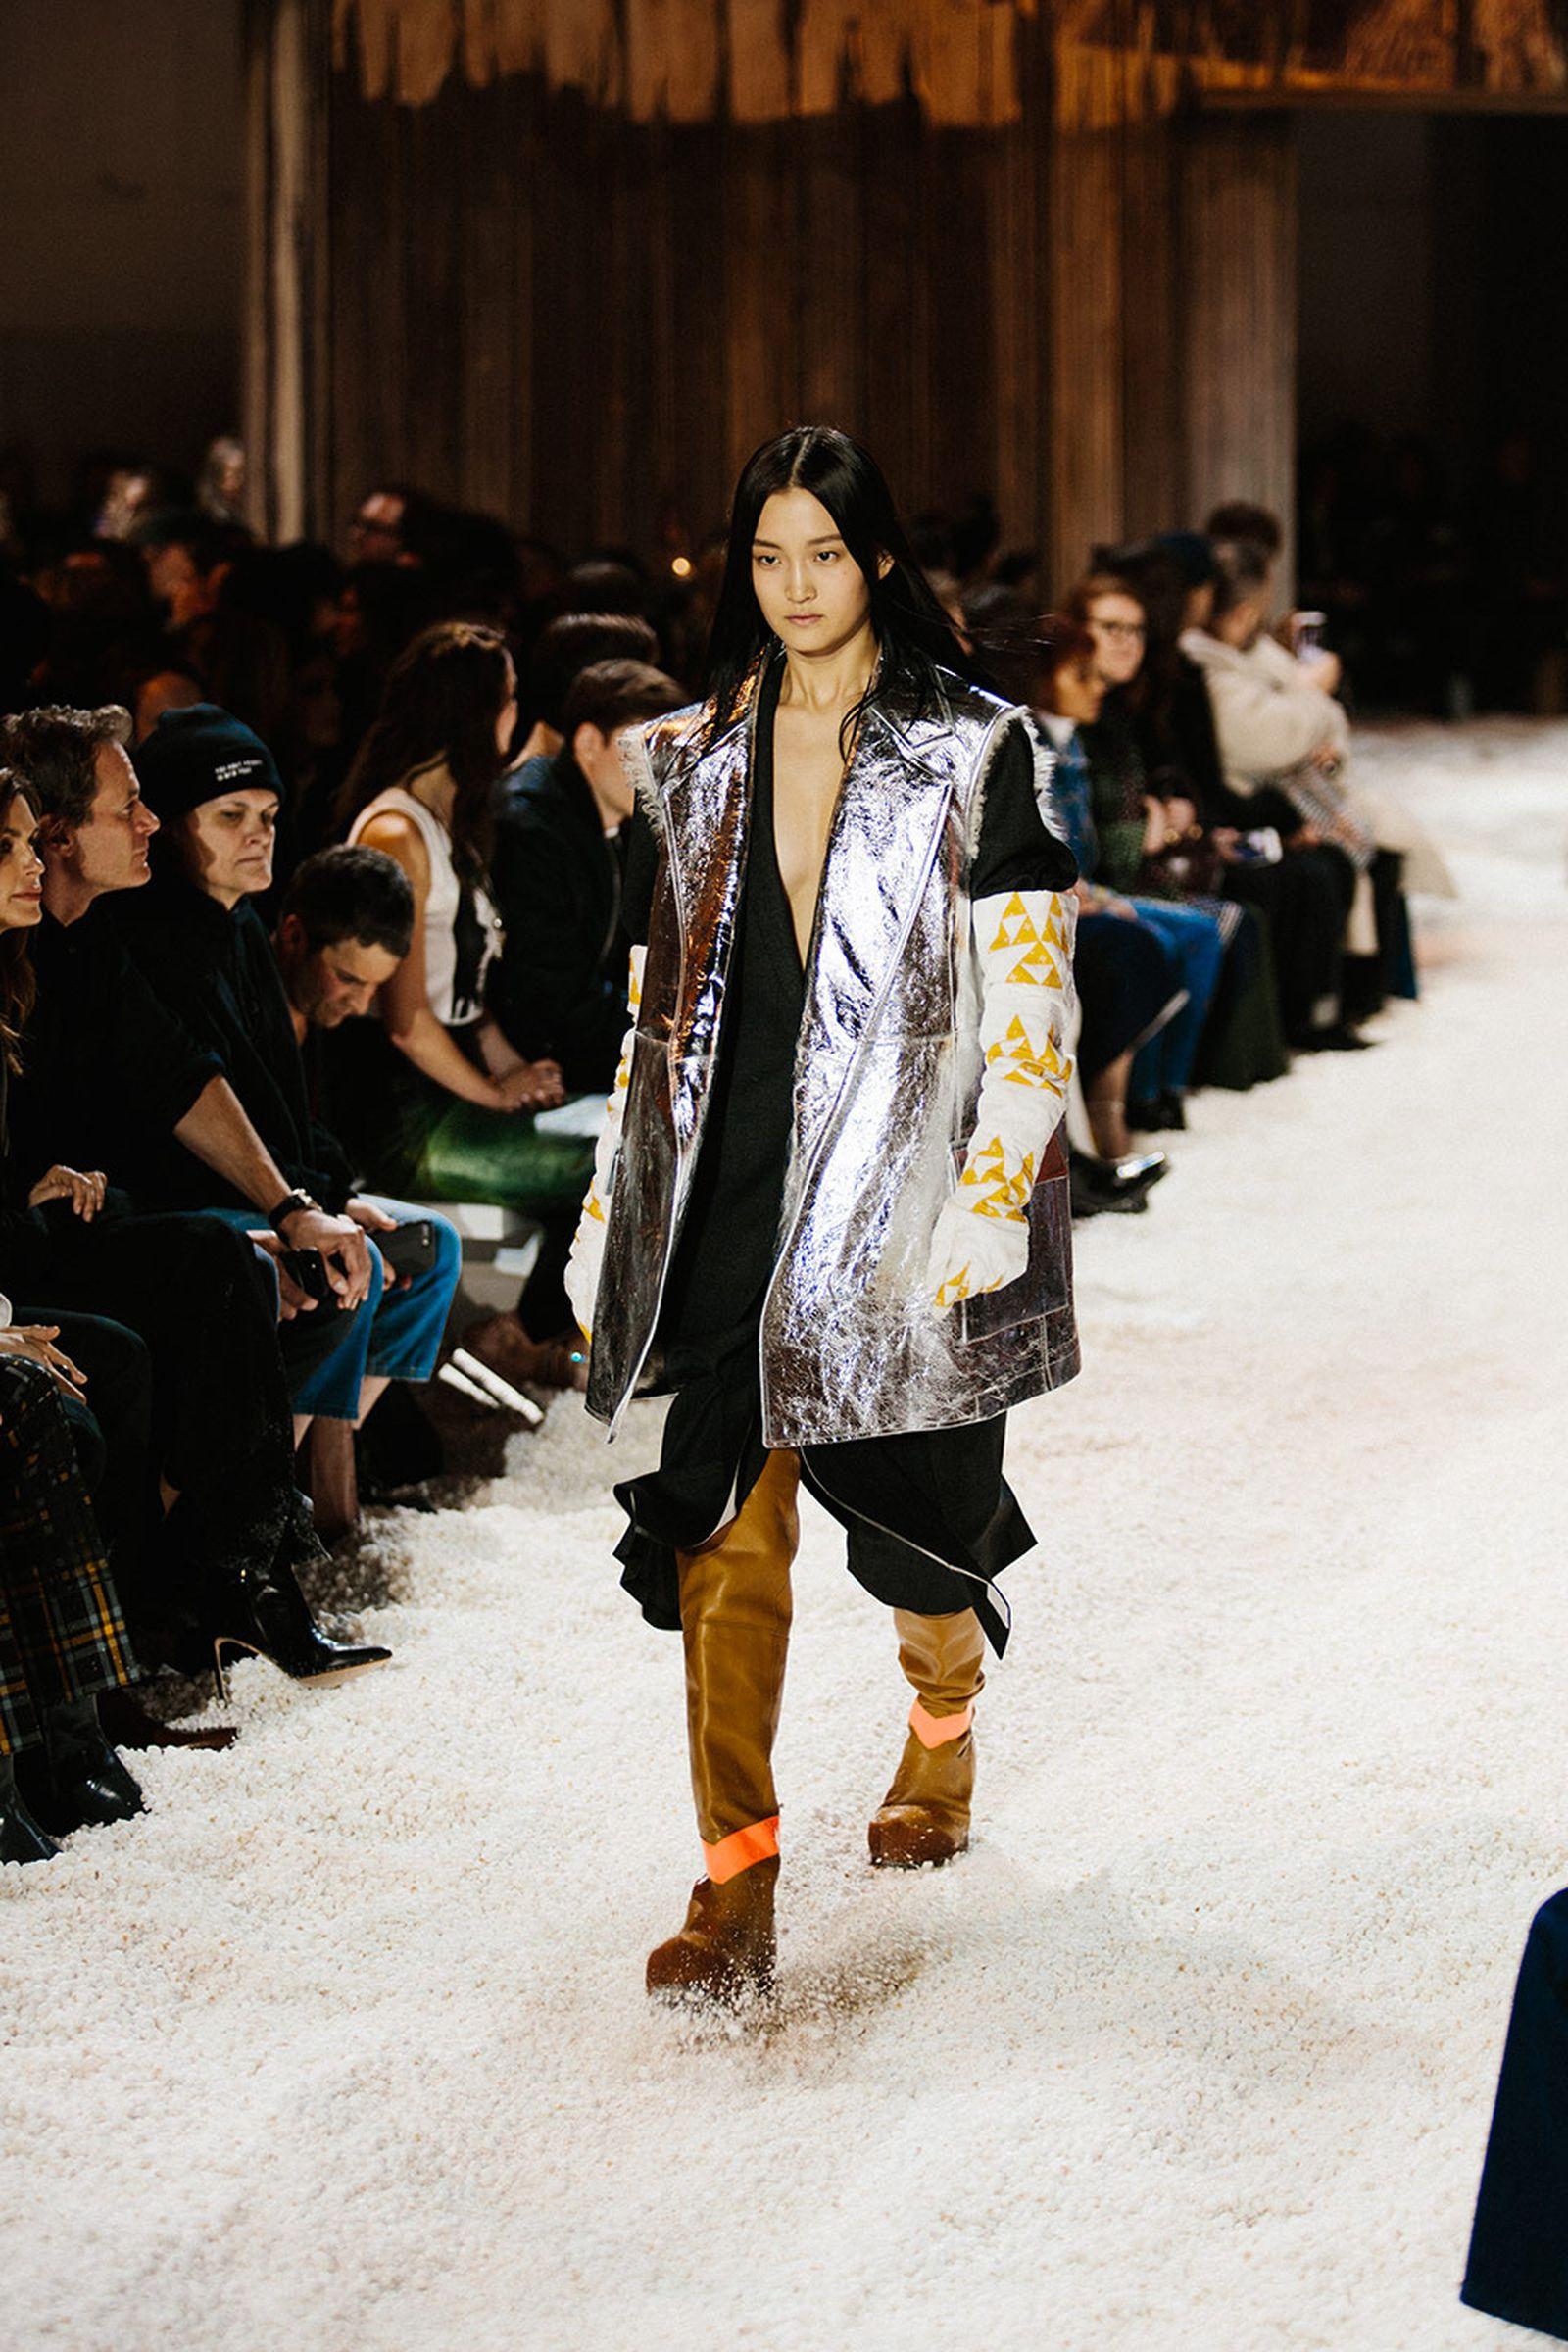 Calvin Klein Fall Winter 2018 Highsnobiety NYFW Raf Simons fashion shows runway